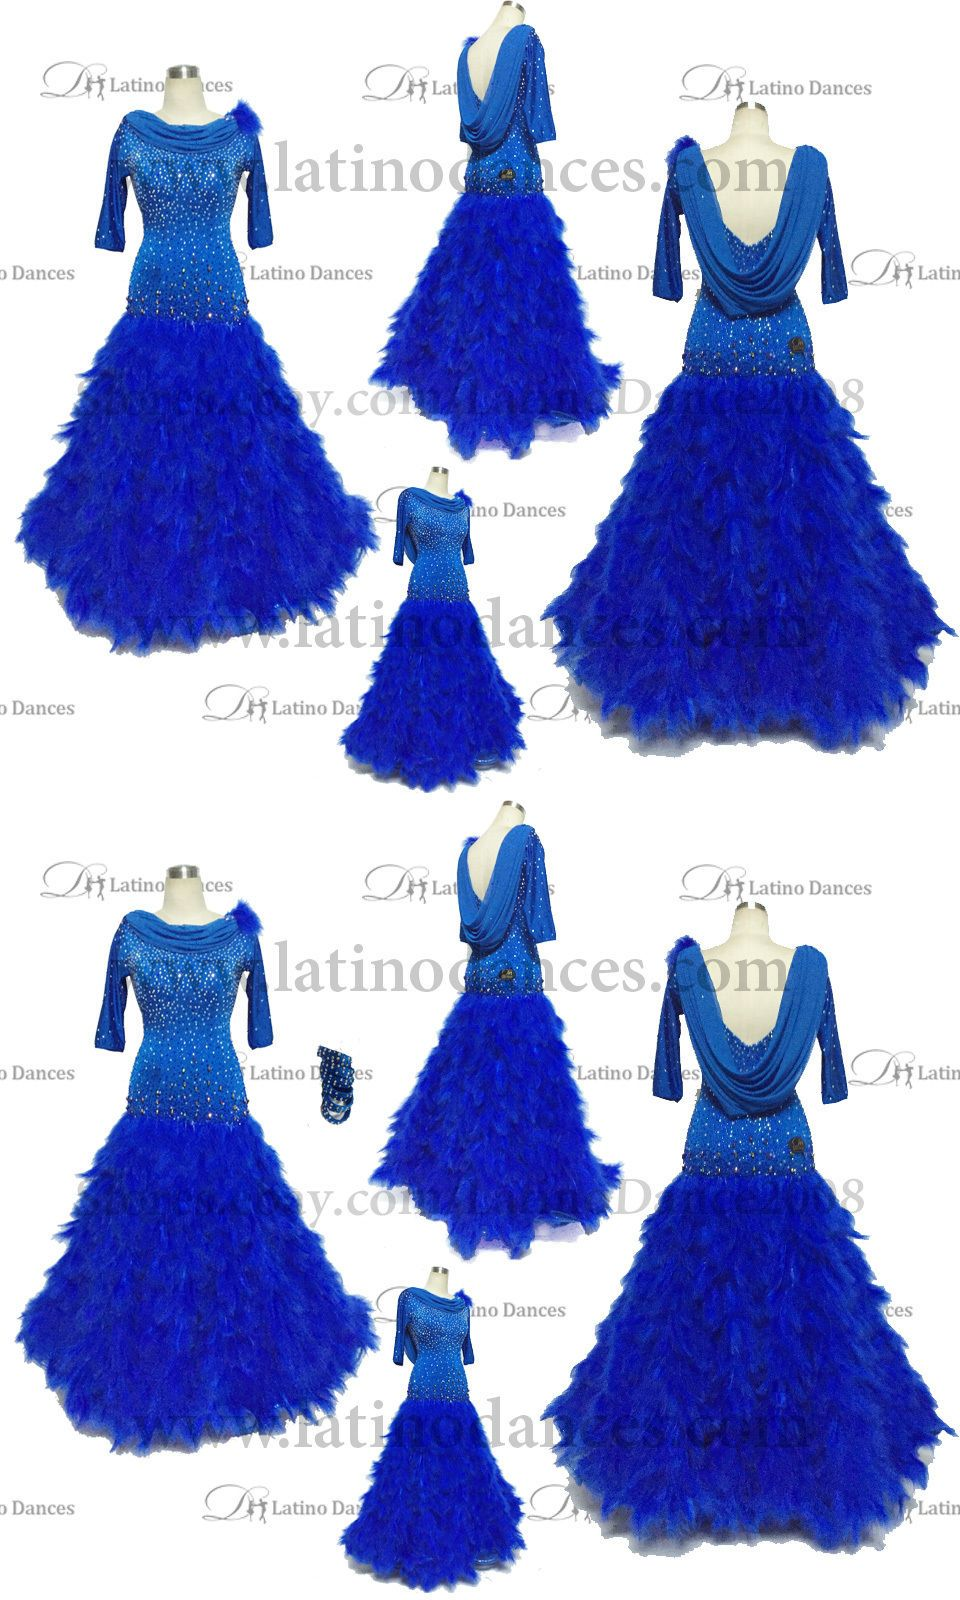 2ef76776c509 Ballroom 152361: Ballroom Standard Waltz Dance Dress With High Quality  Rhinestone St240 -> BUY IT NOW ONLY: $459 on #eBay #ballroom #standard # waltz #dance ...